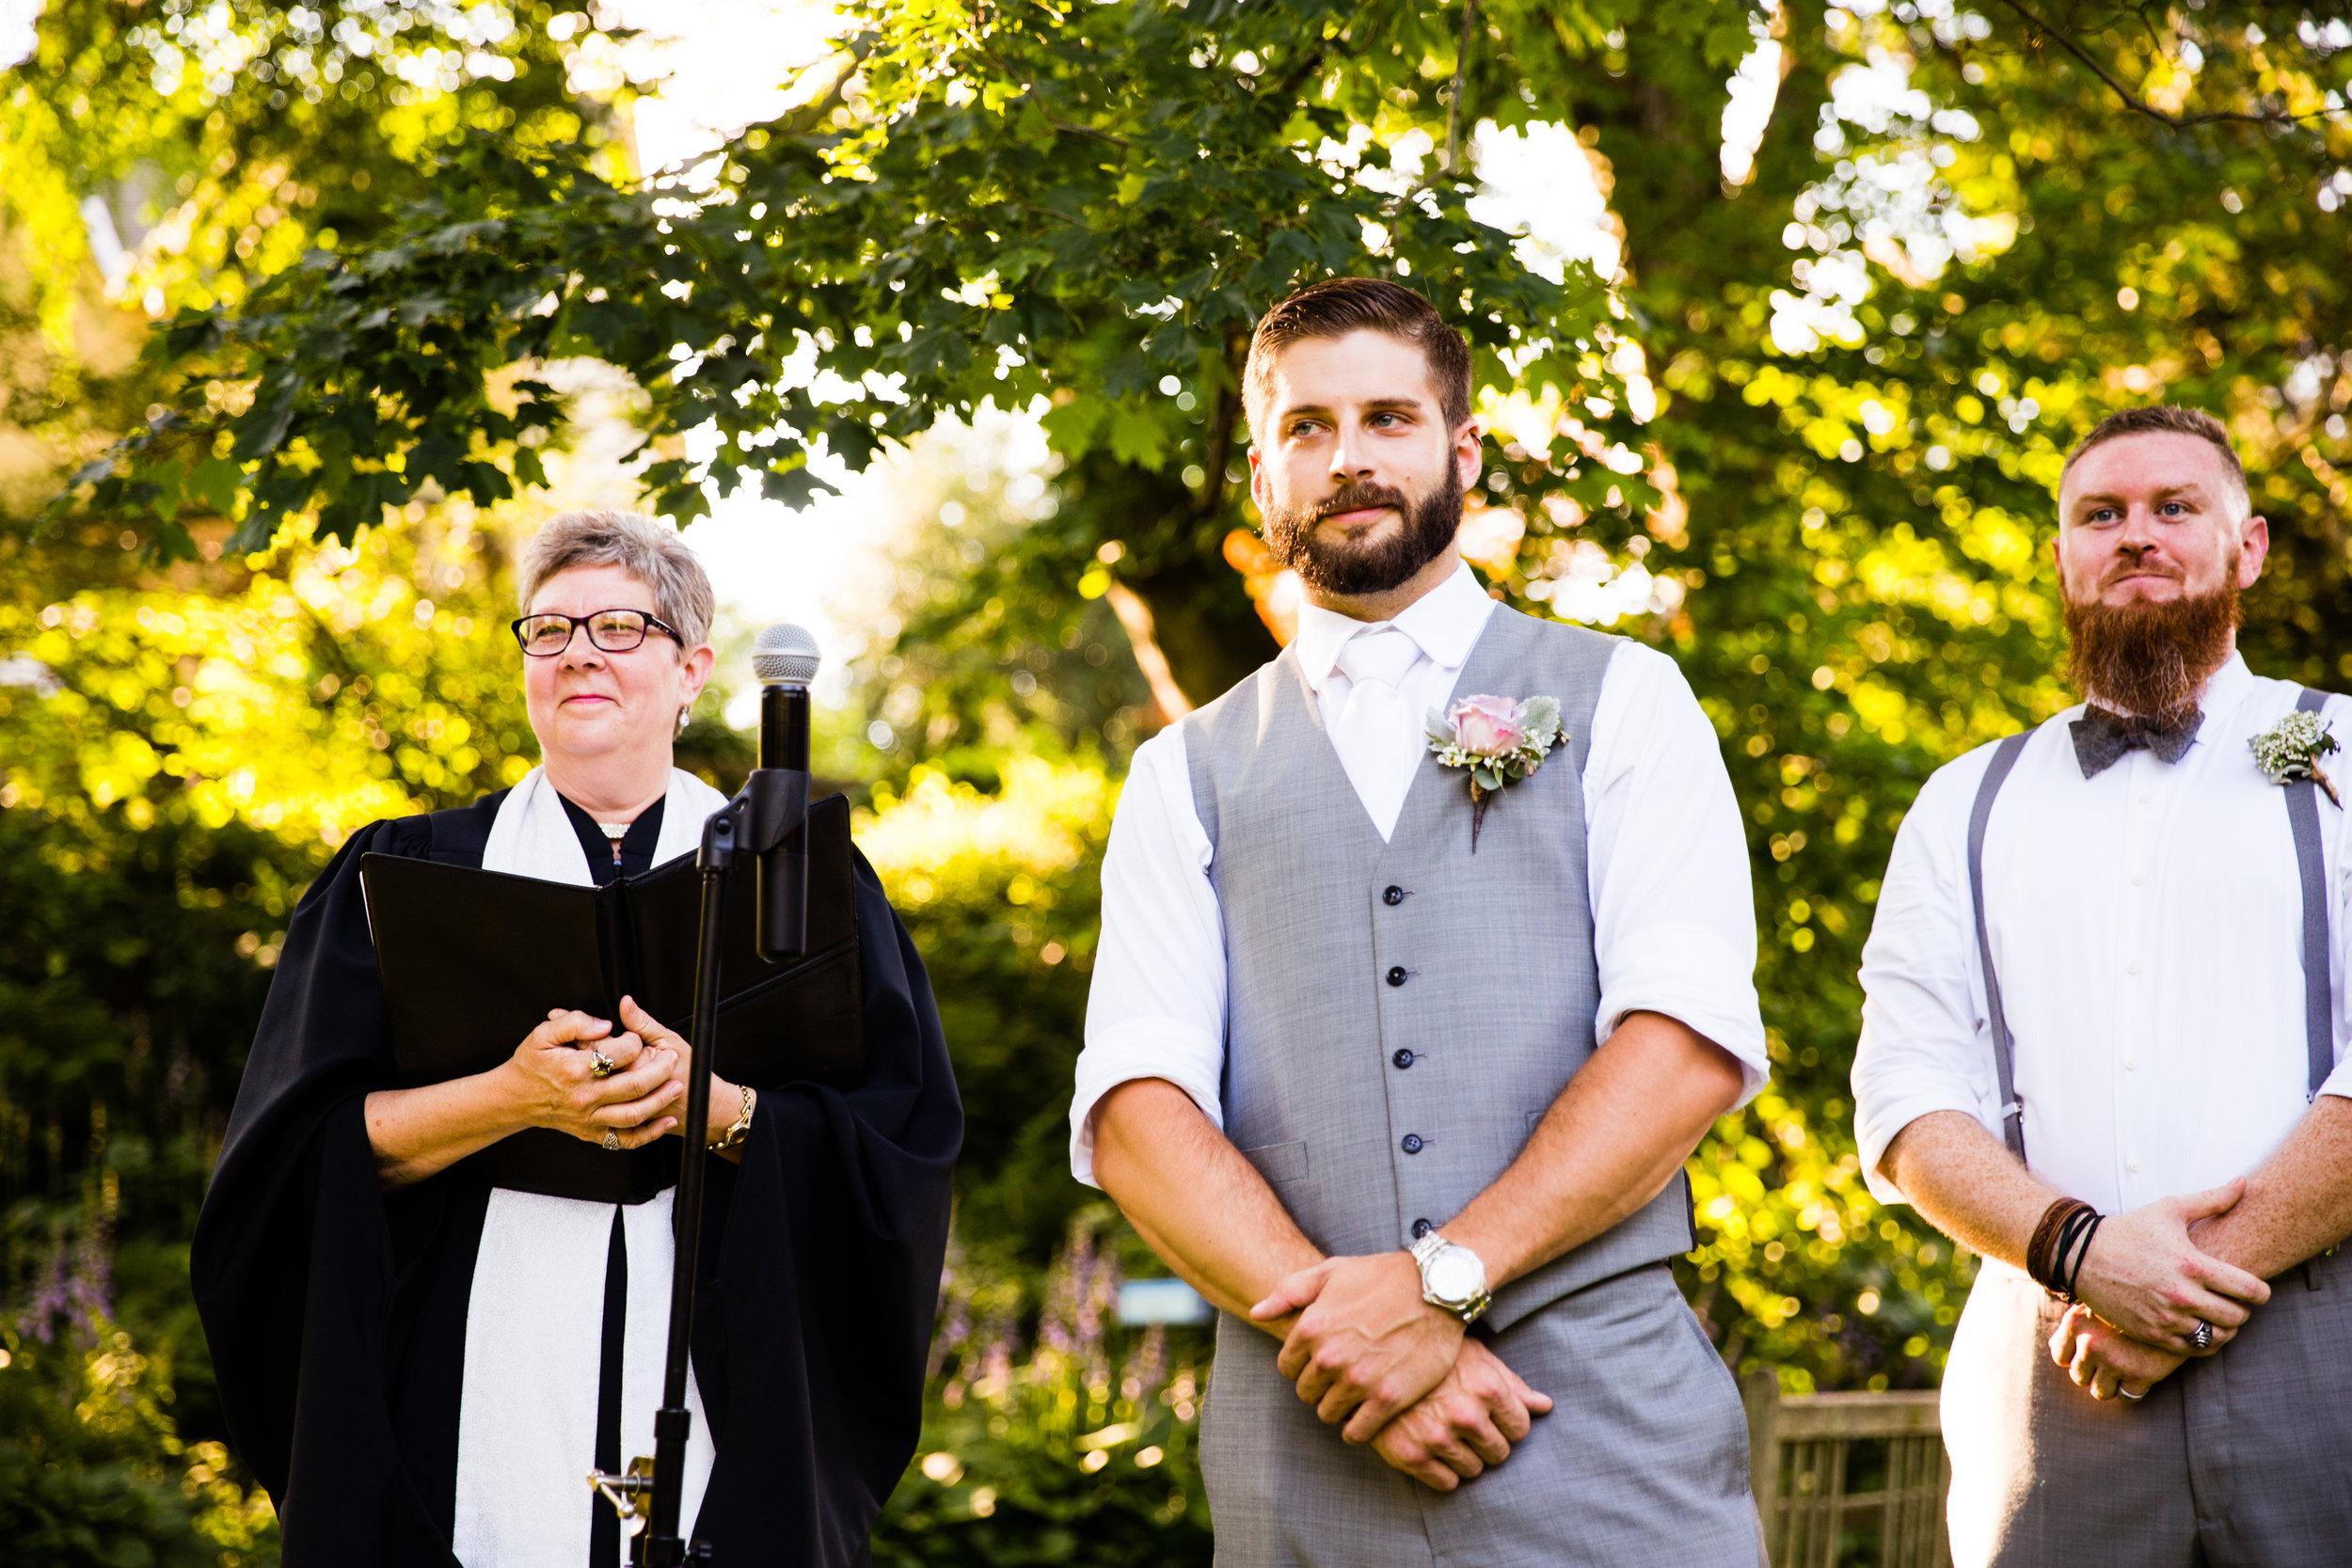 TYLER ARBORETUM WEDDING PHOTOGRAPHY LOVESTRUCK PICTURES-049.jpg